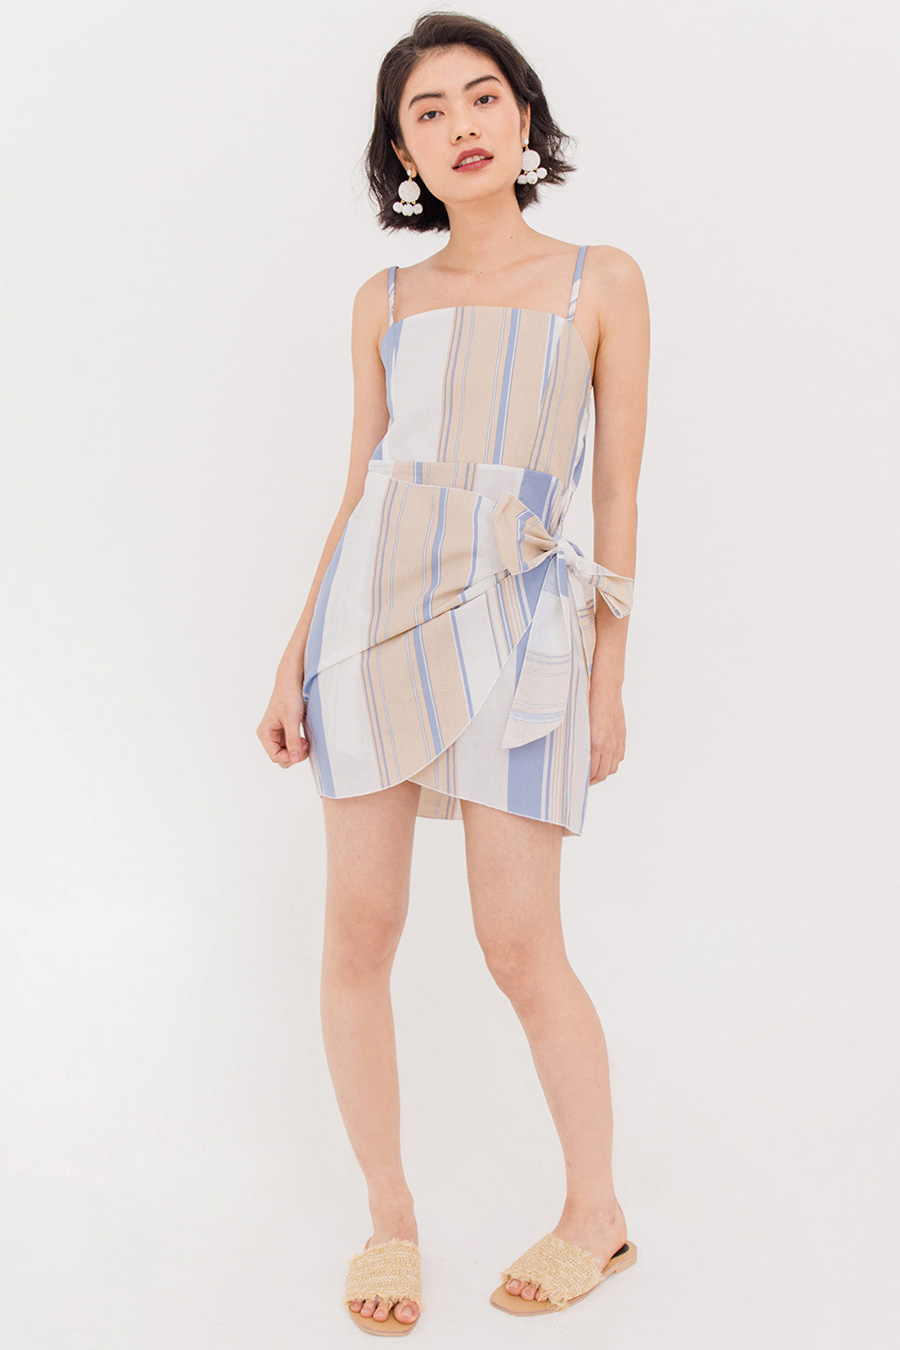 BRUNA THIN STRAP WRAP DRESS - BLUE